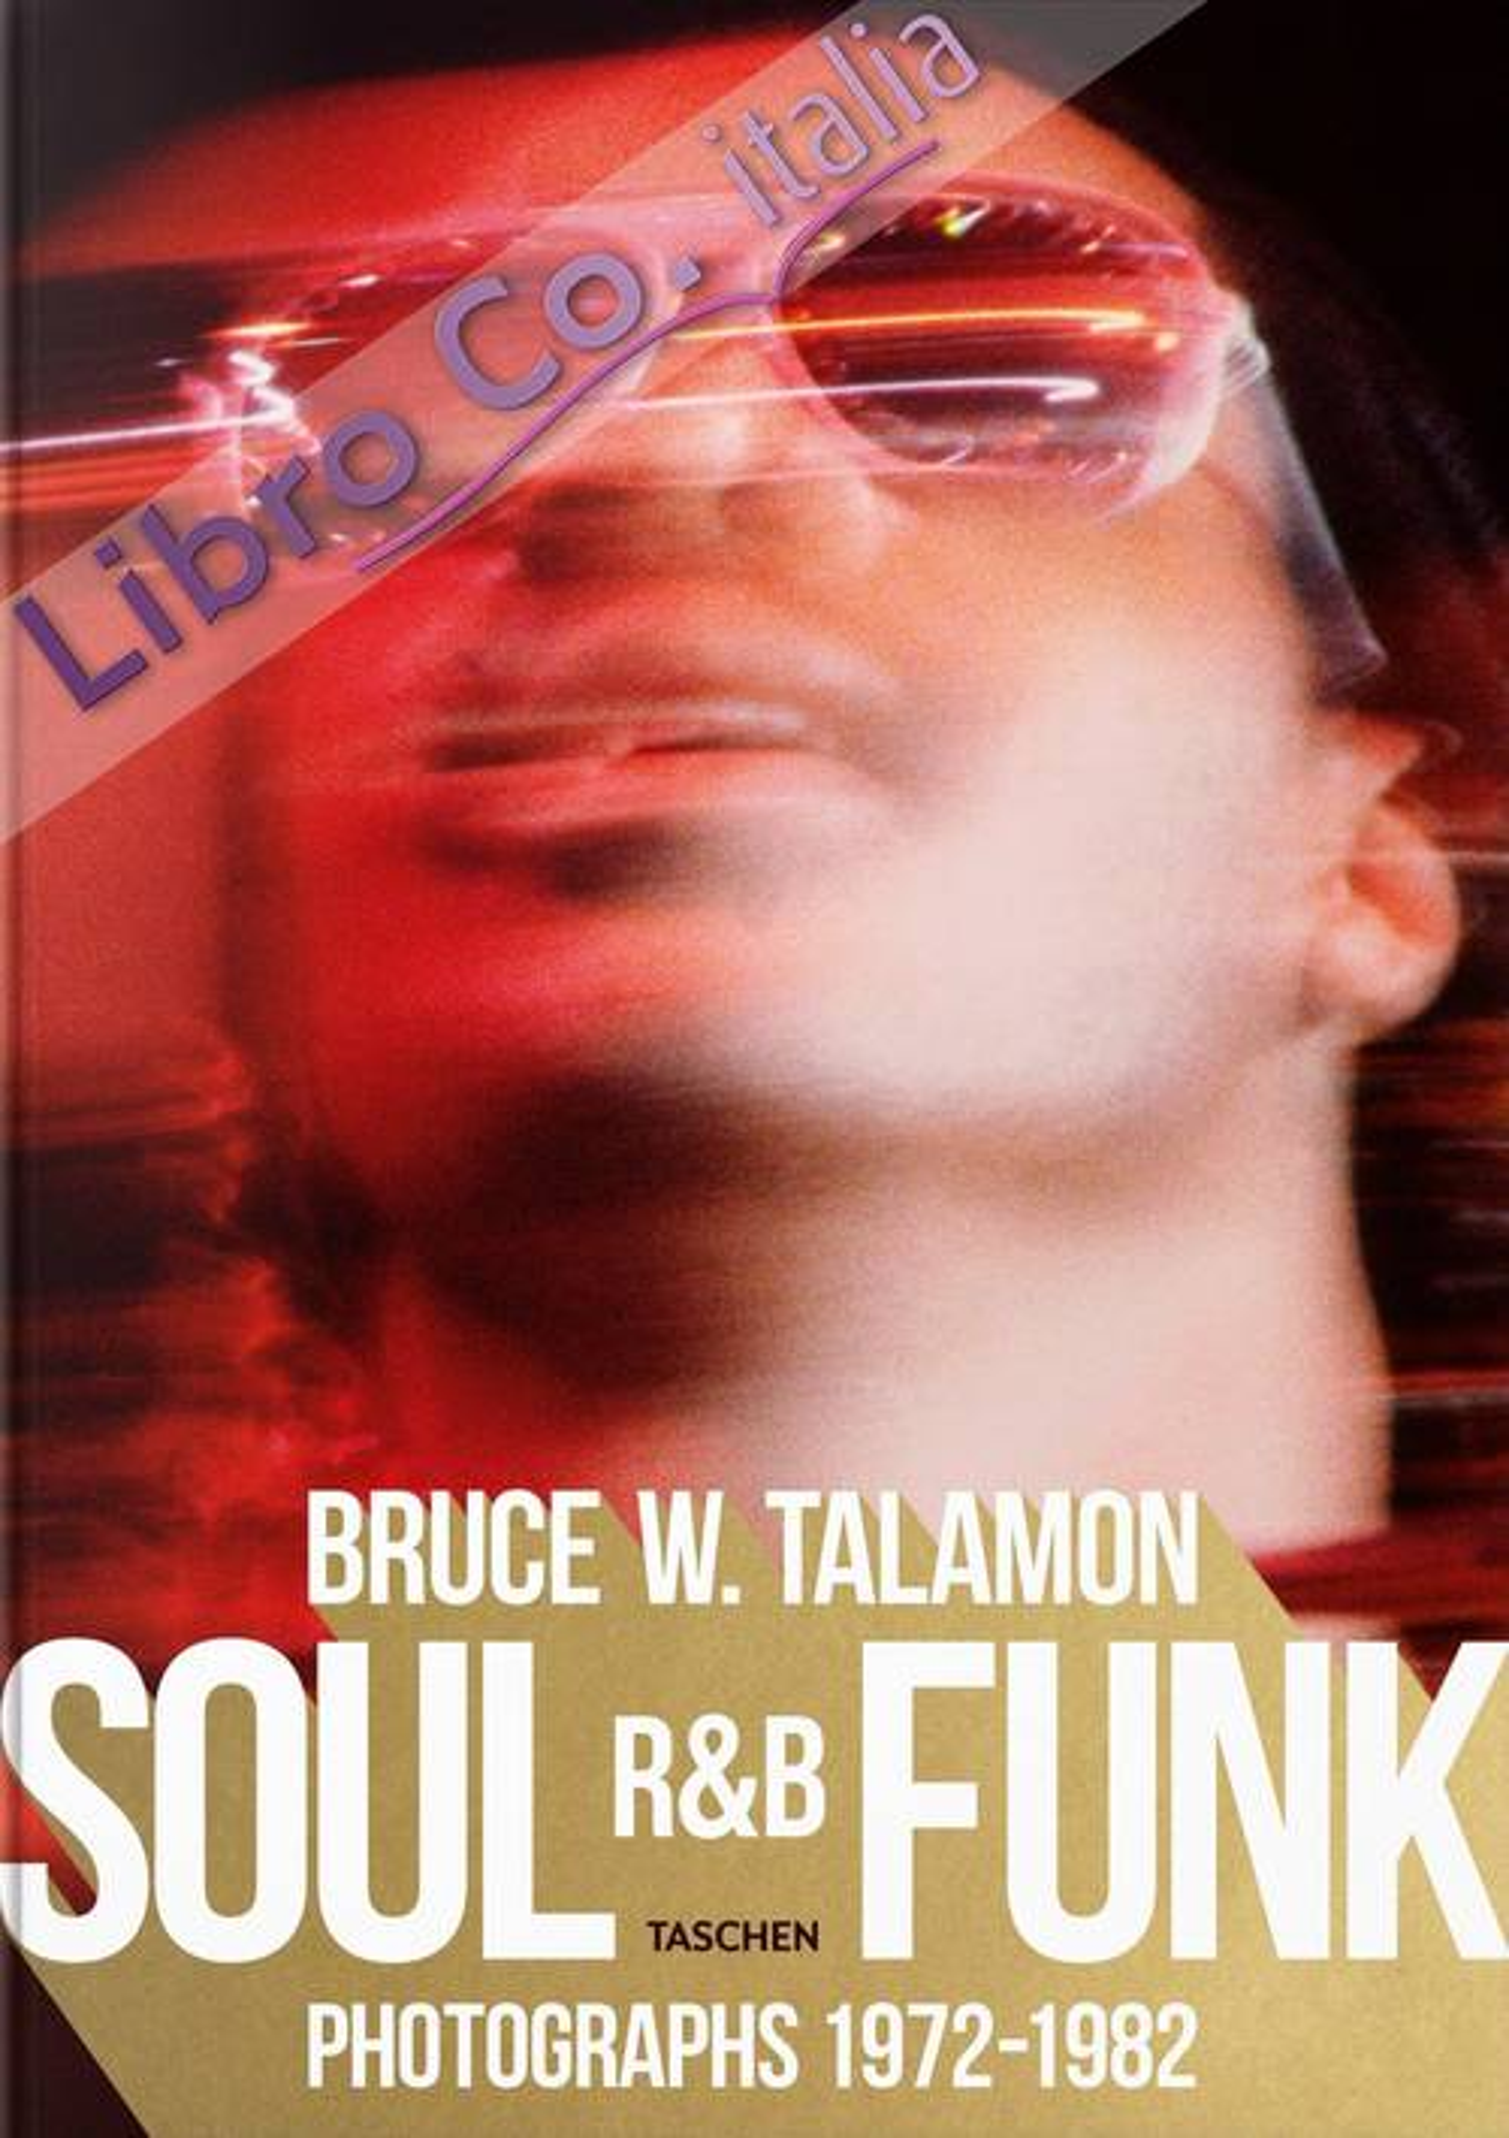 Bruce Talamon. Soul R&B funk. Photographs 1972-1982. Ediz. inglese, francese e tedesca